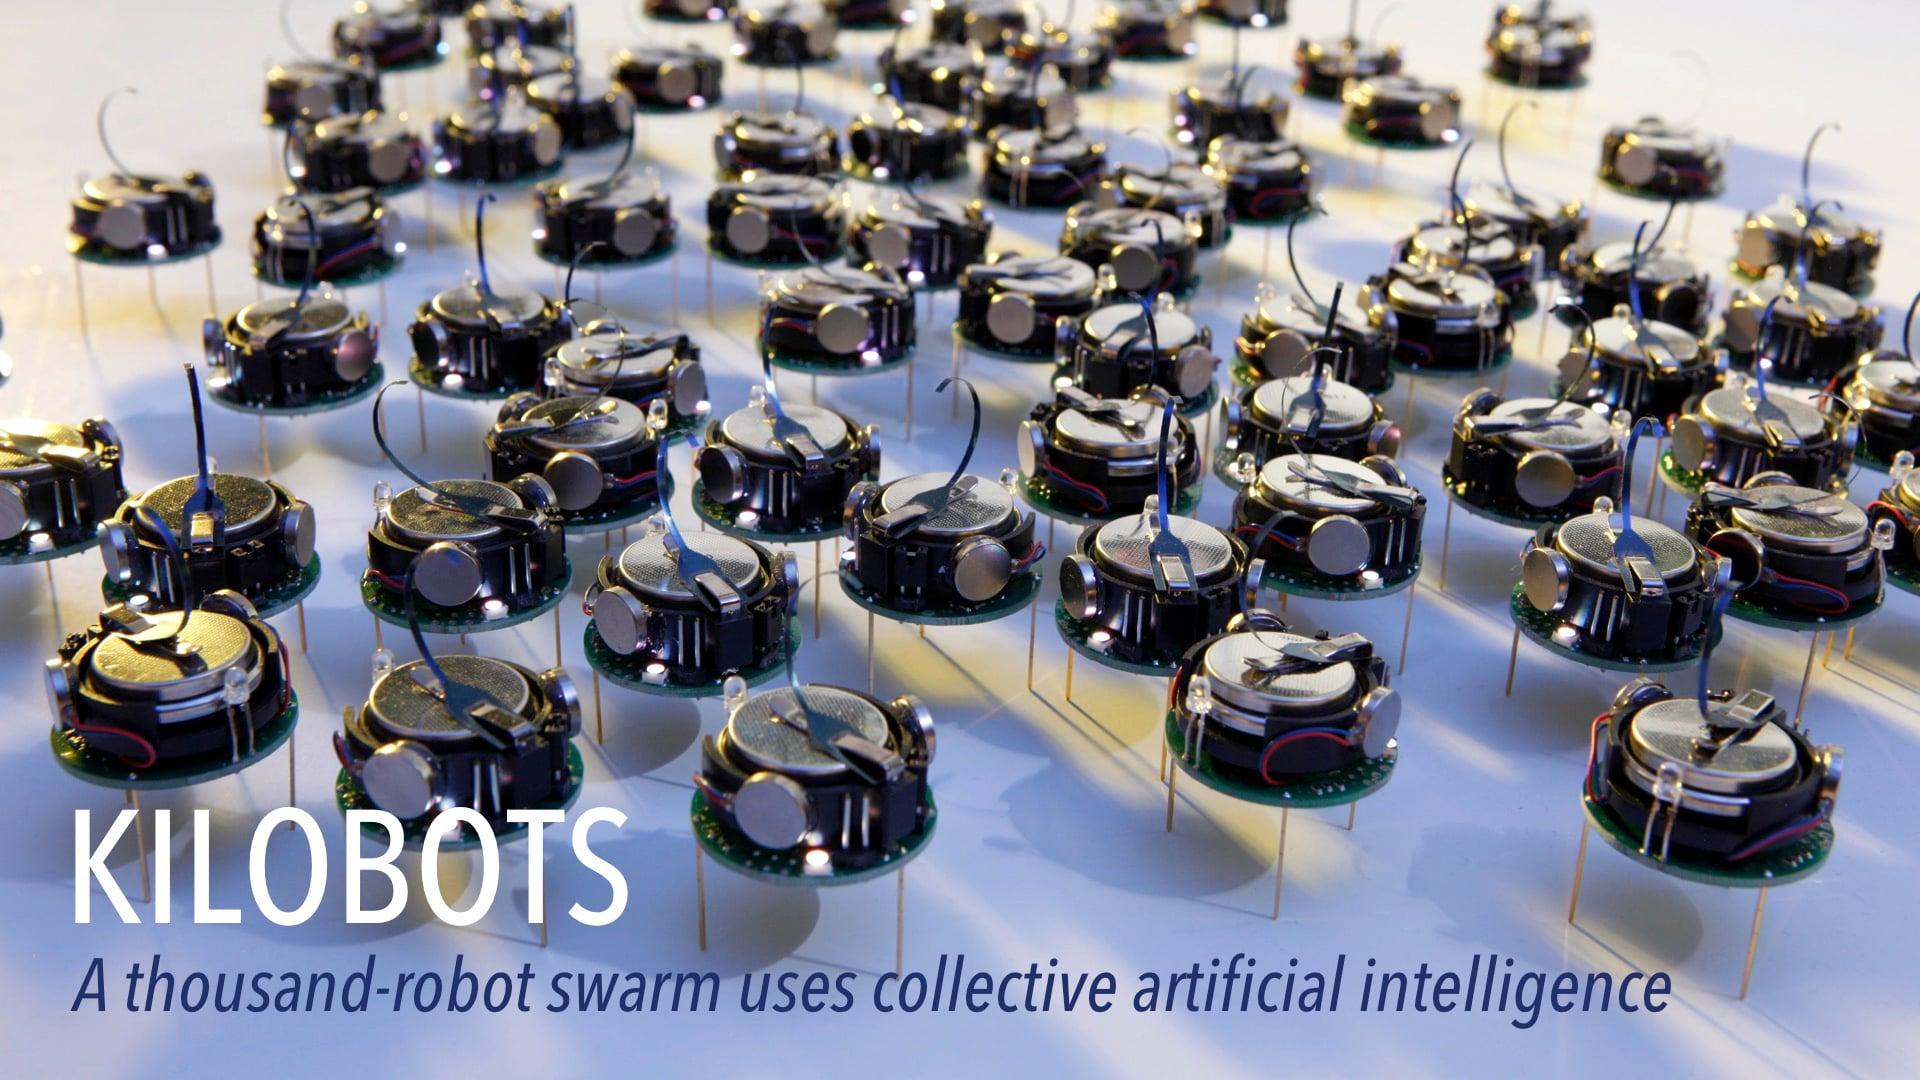 Kilobots: A Thousand-Robot Swarm